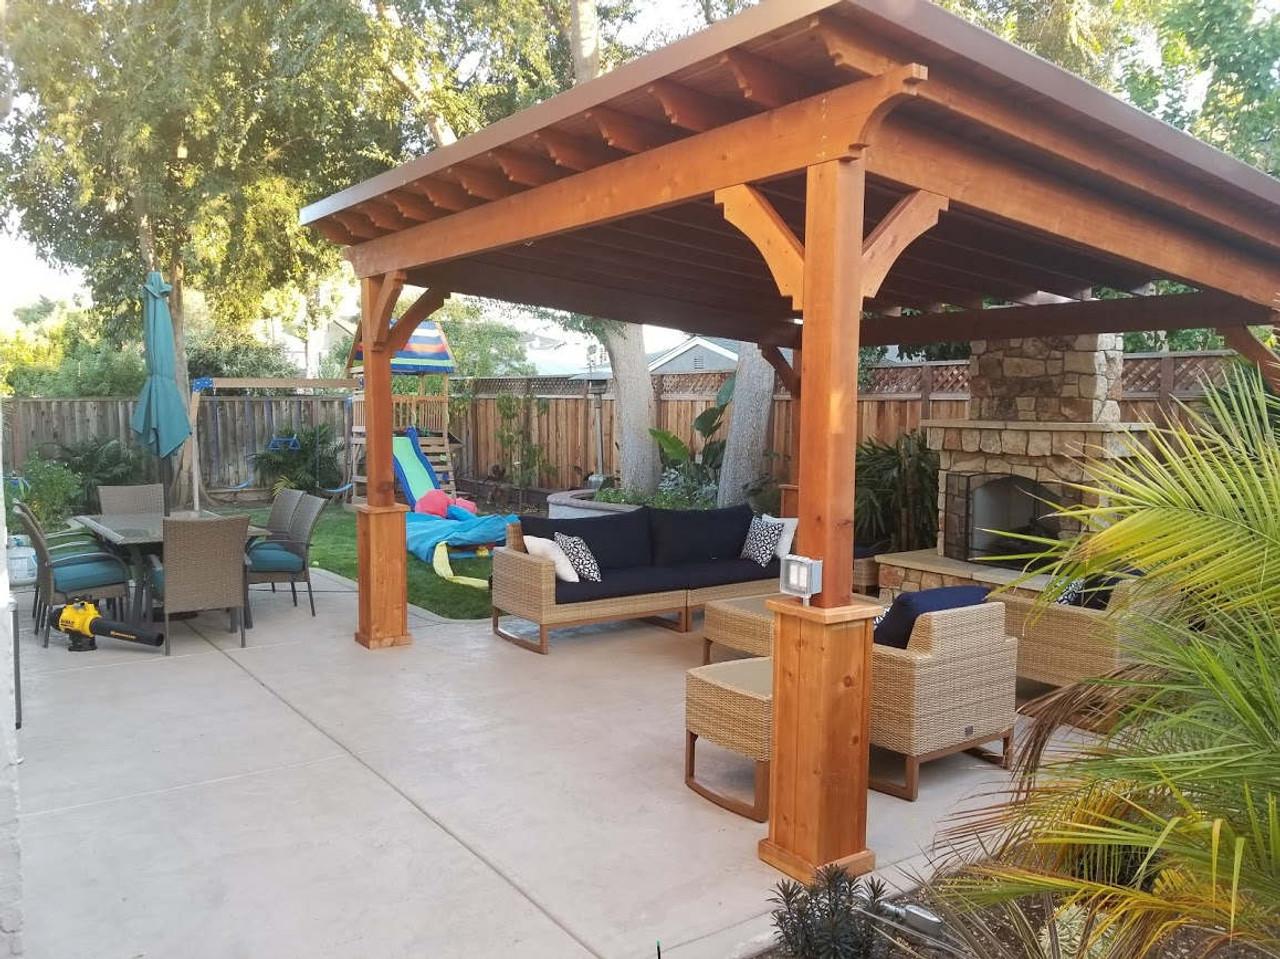 14x14 Lean To cedar pavilion. Cedar color stain. Brown metal panel roofing. No overhang on back side. San Jose, CA.